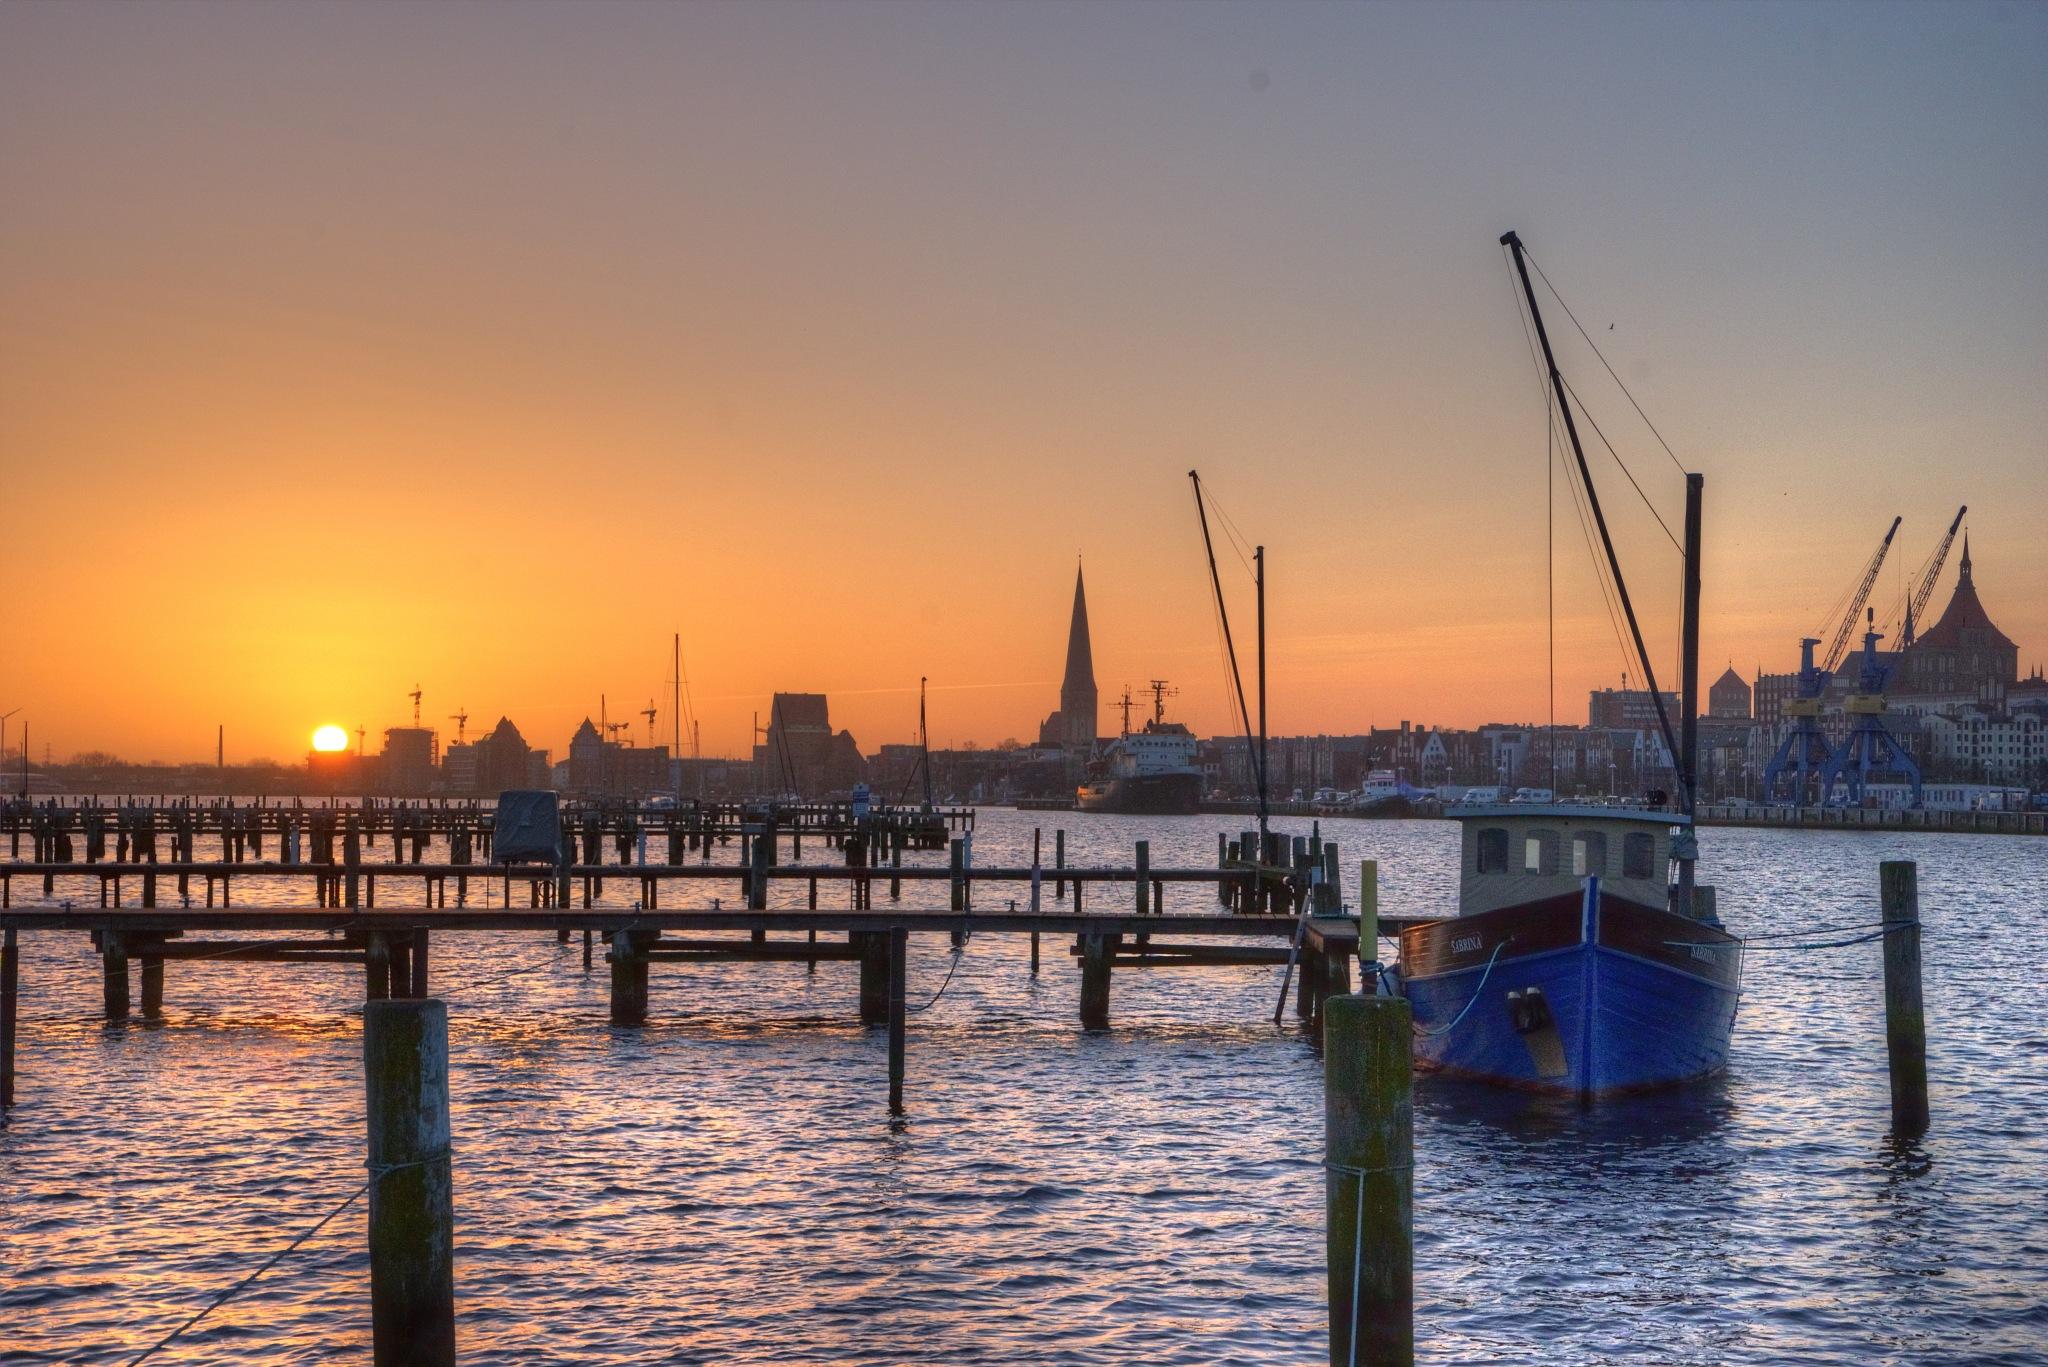 Morgendliches Rostock by diplompunk